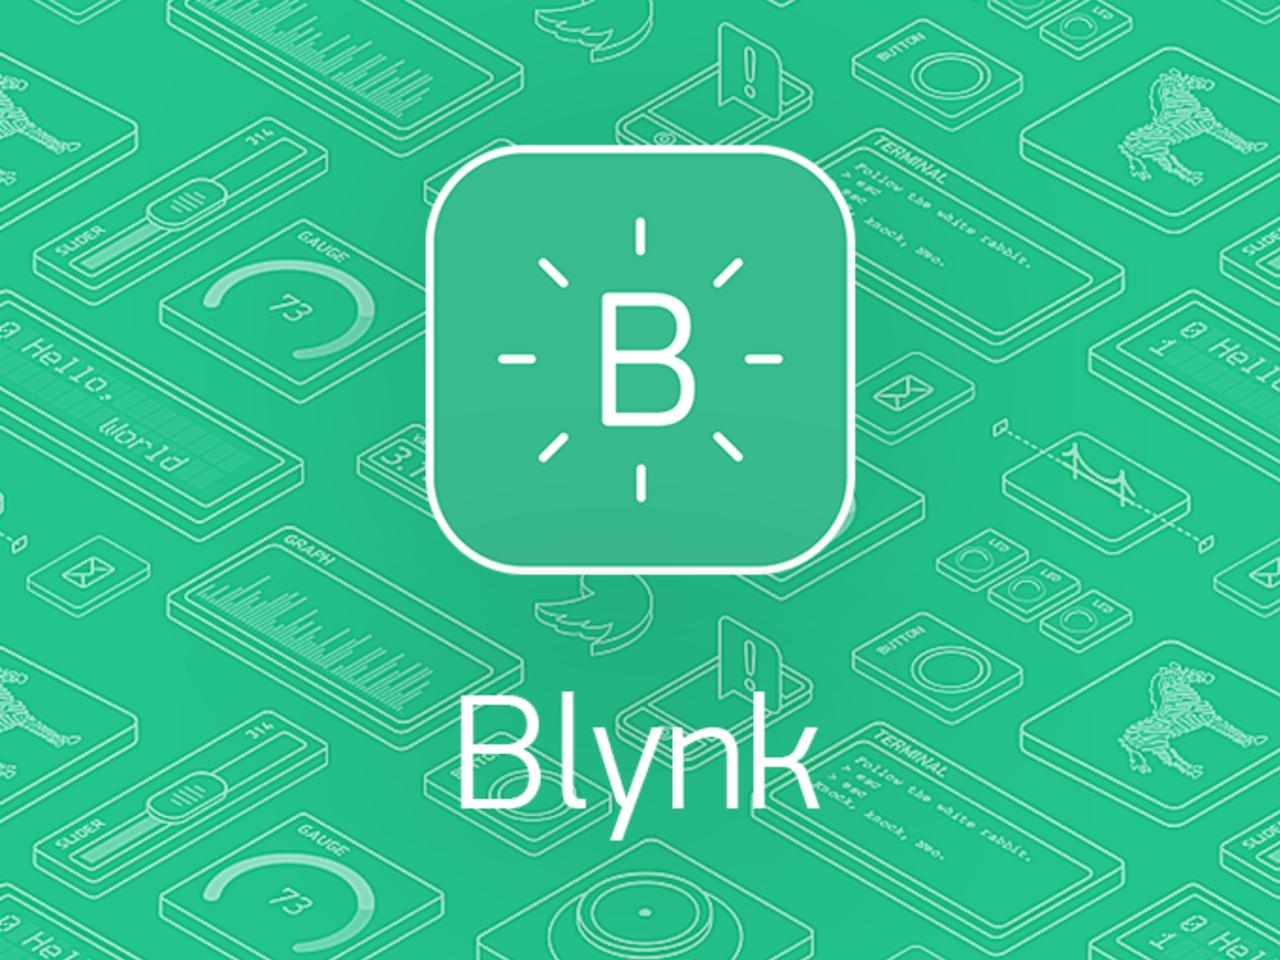 Blynk